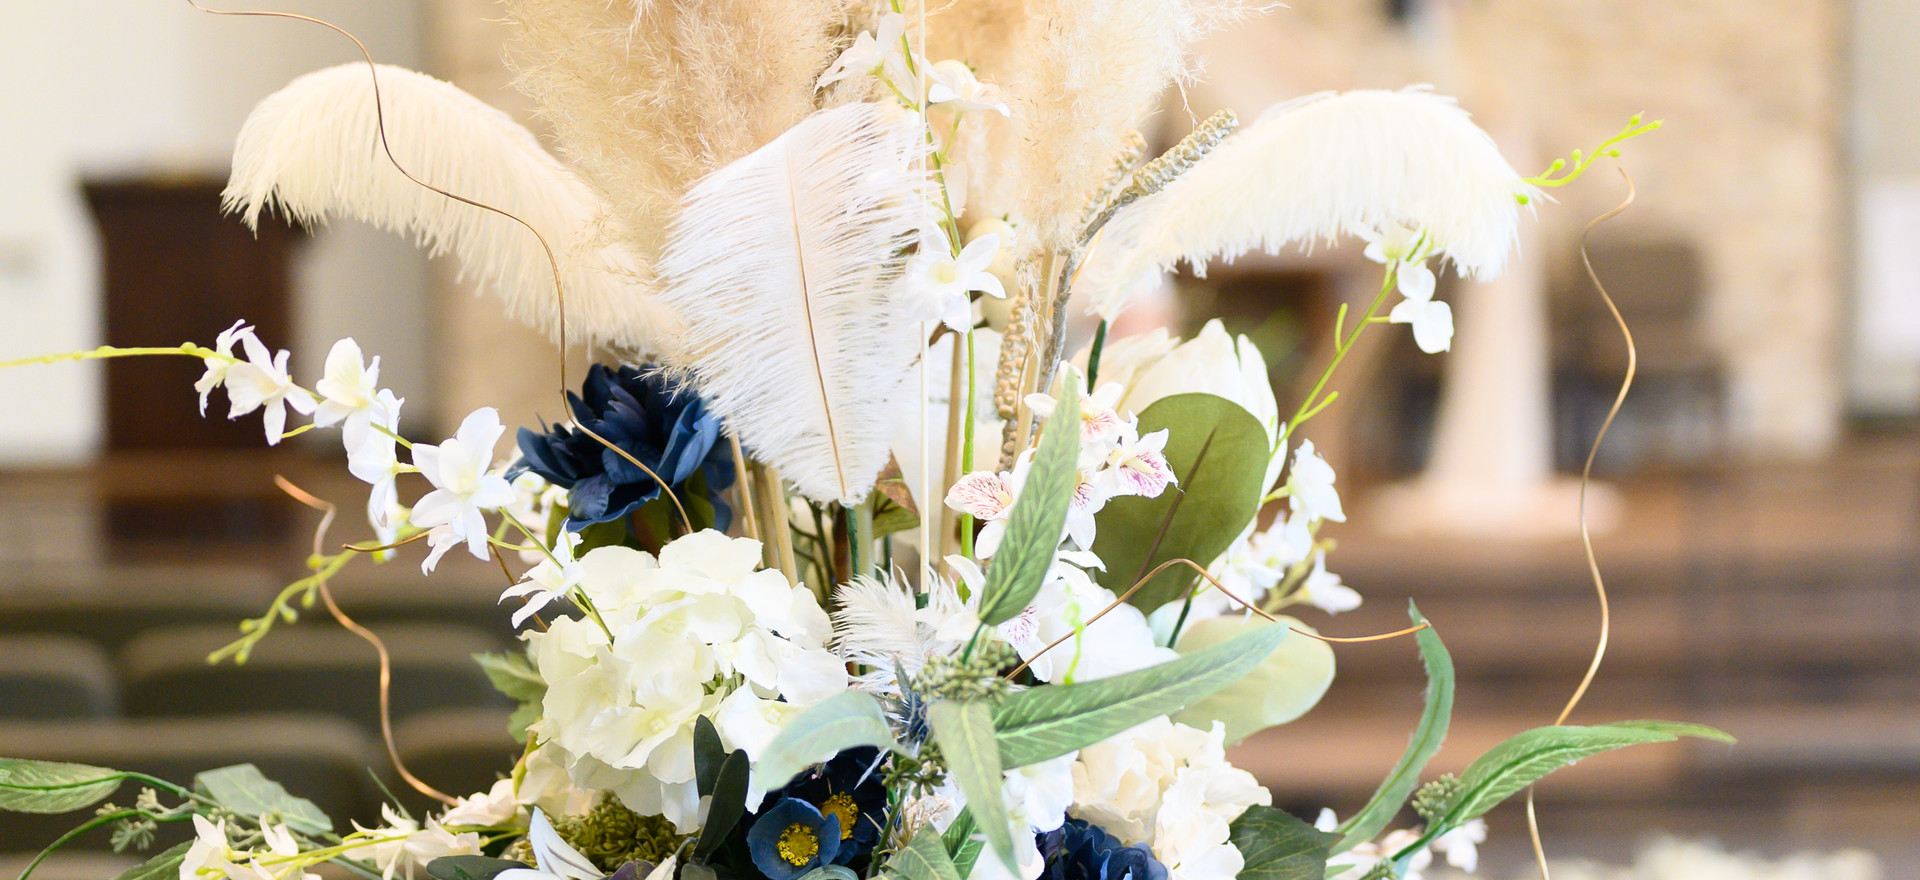 027_Lorena and Mike's Wedding day.jpg